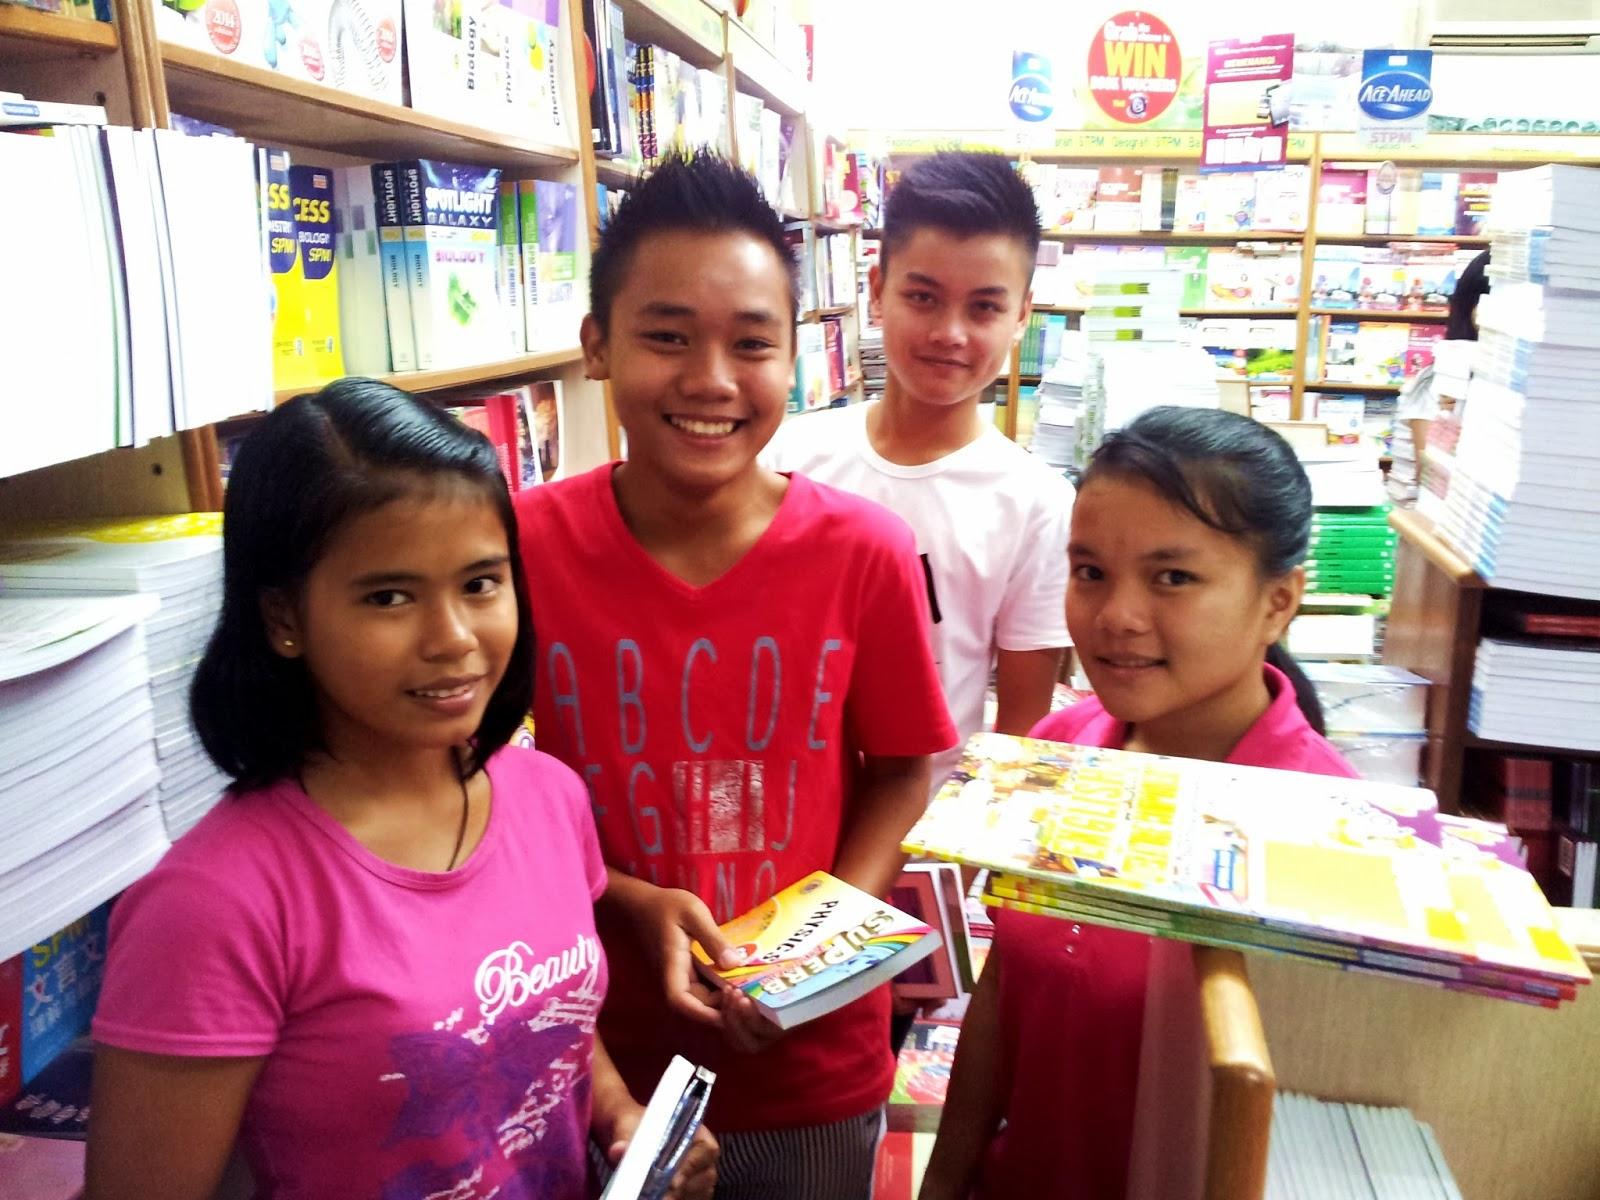 Pelajar SMK Katibas, Song di kedai buku di Sibu